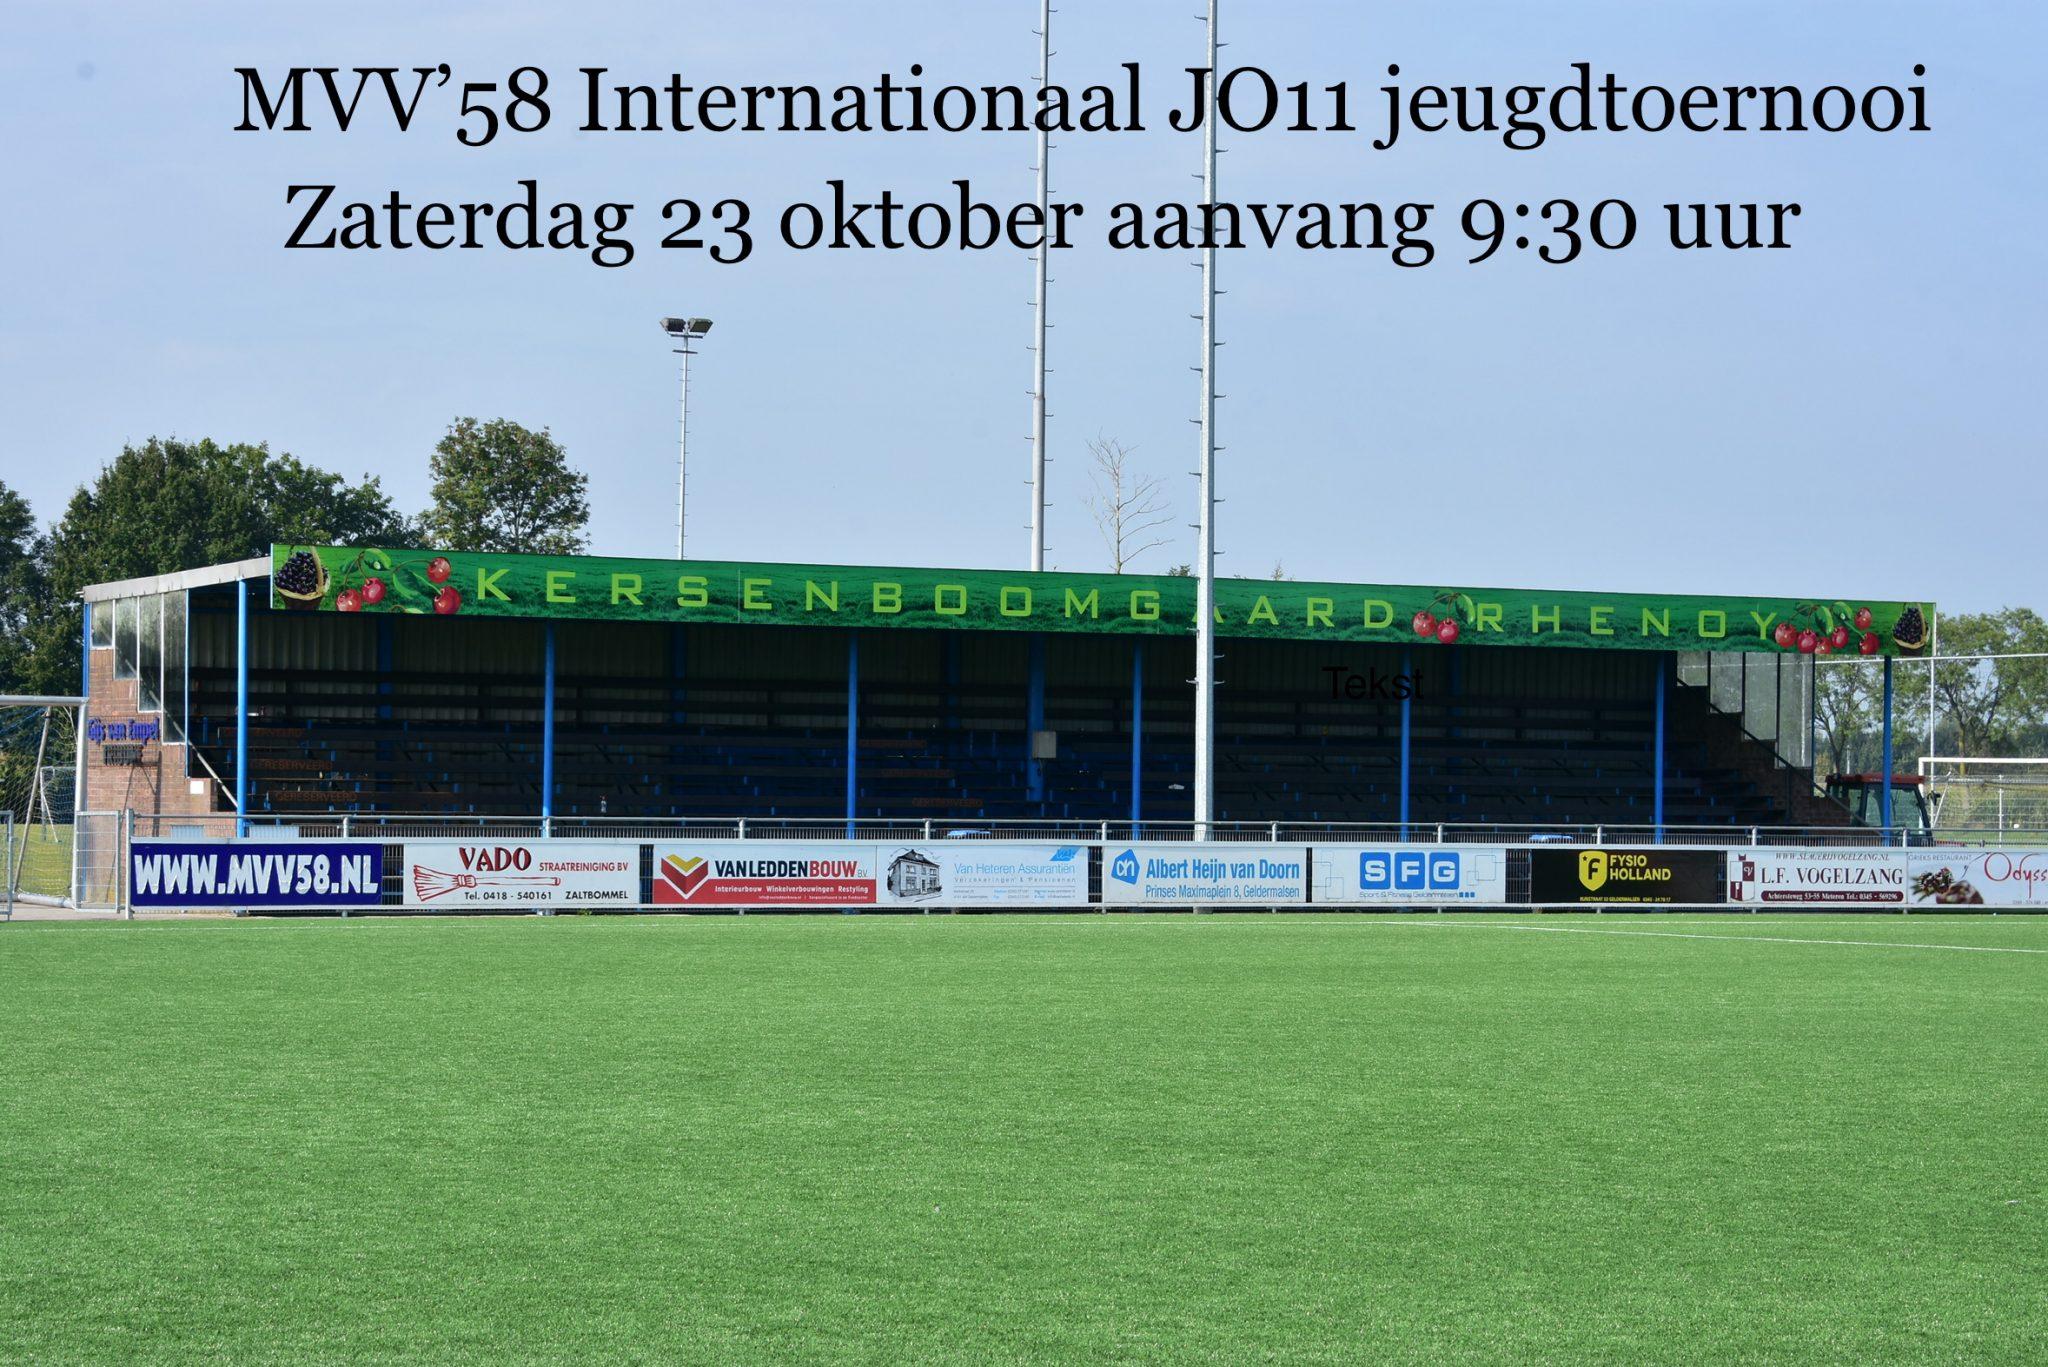 Internationaal toernooi JO11 op zaterdag 23 oktober